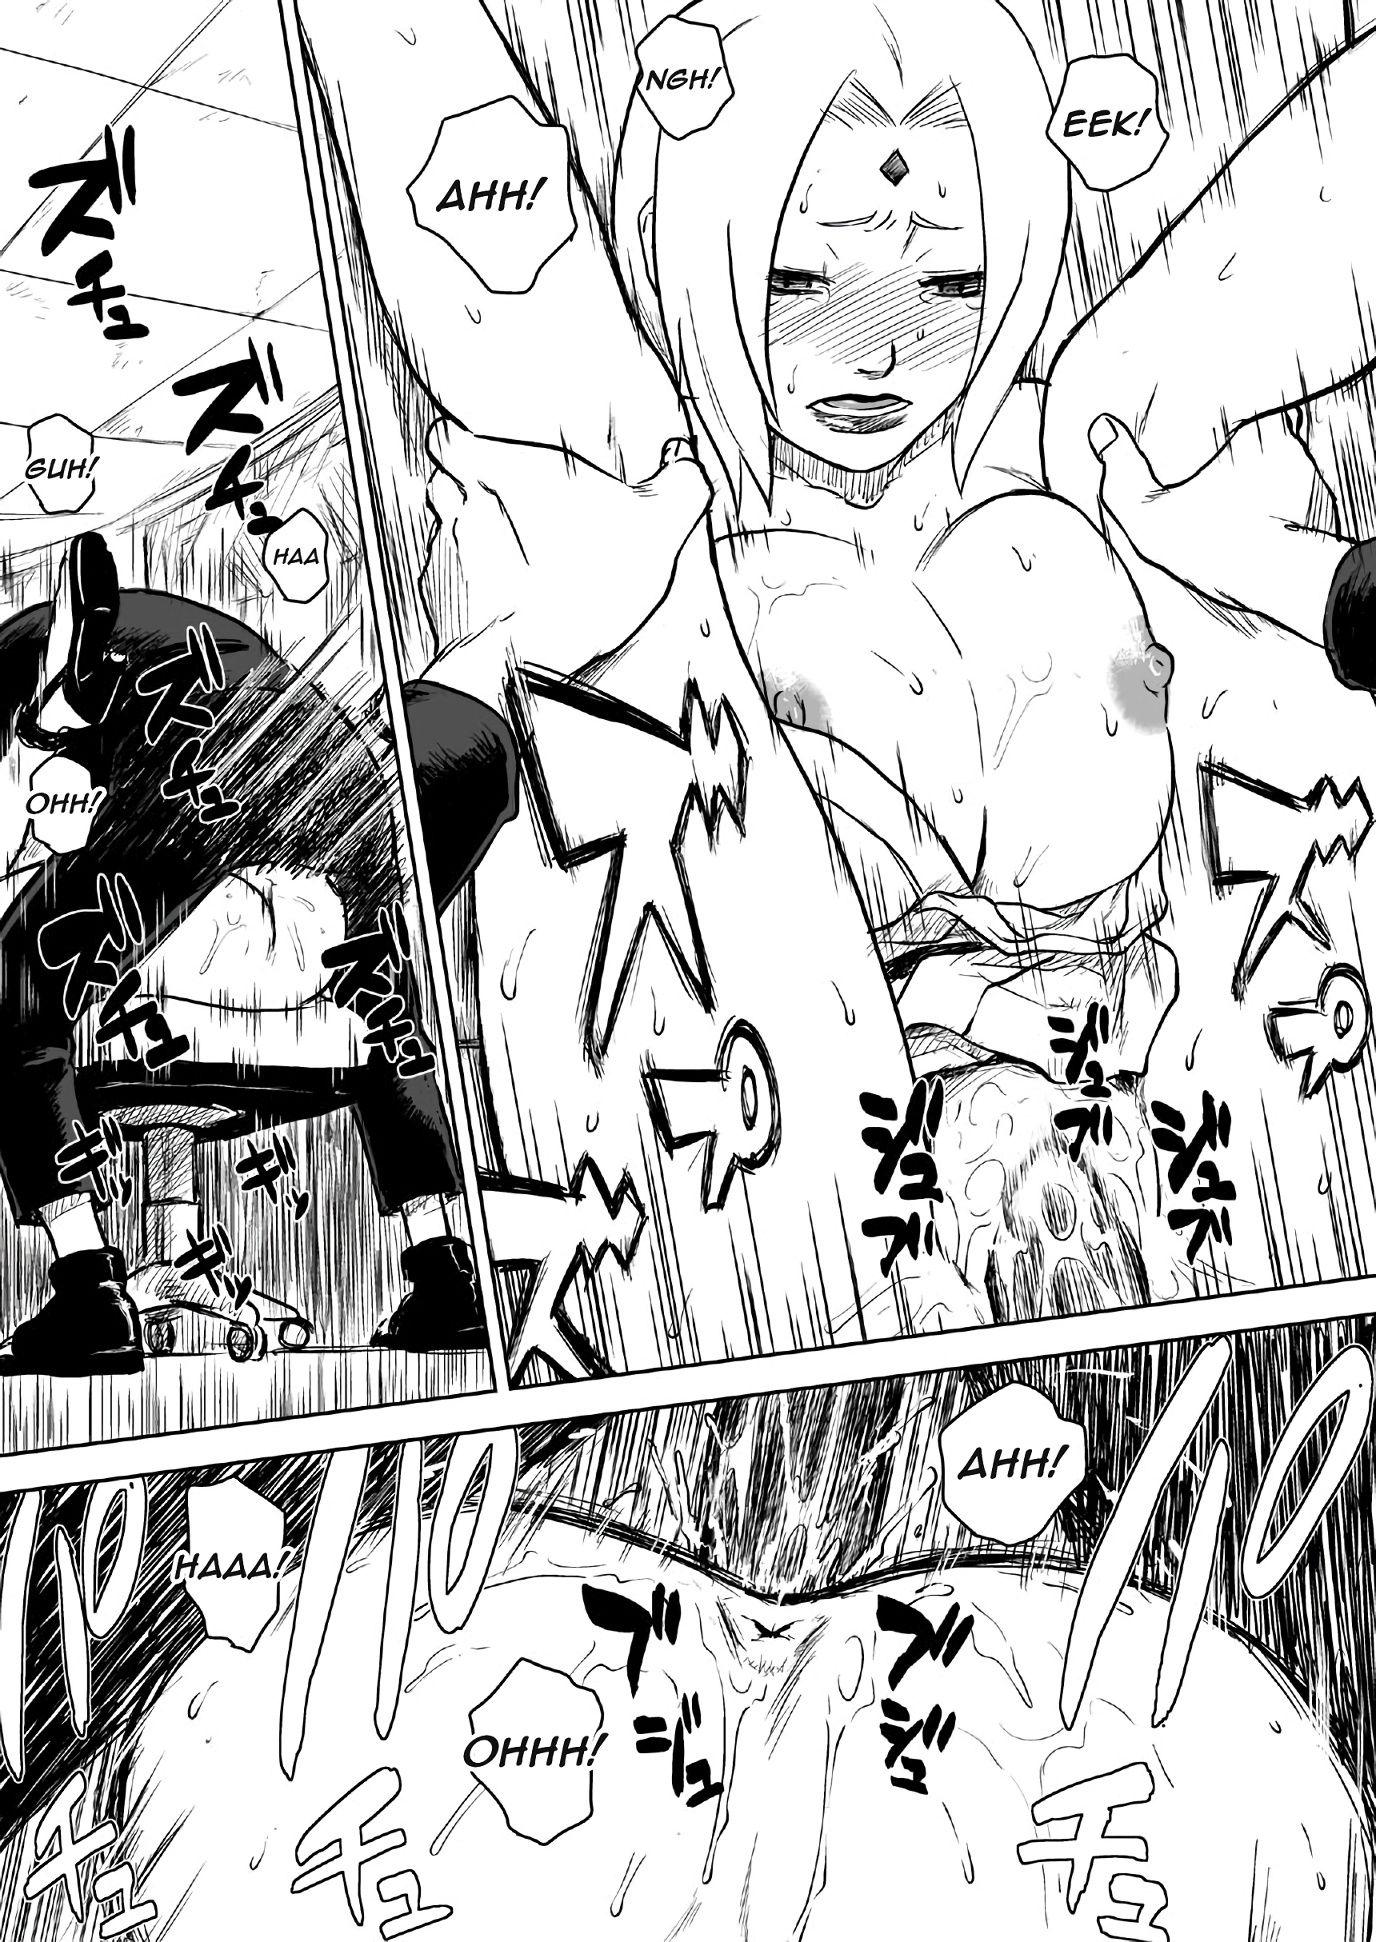 Ninja dependence vol. 5 hentai manga picture 7